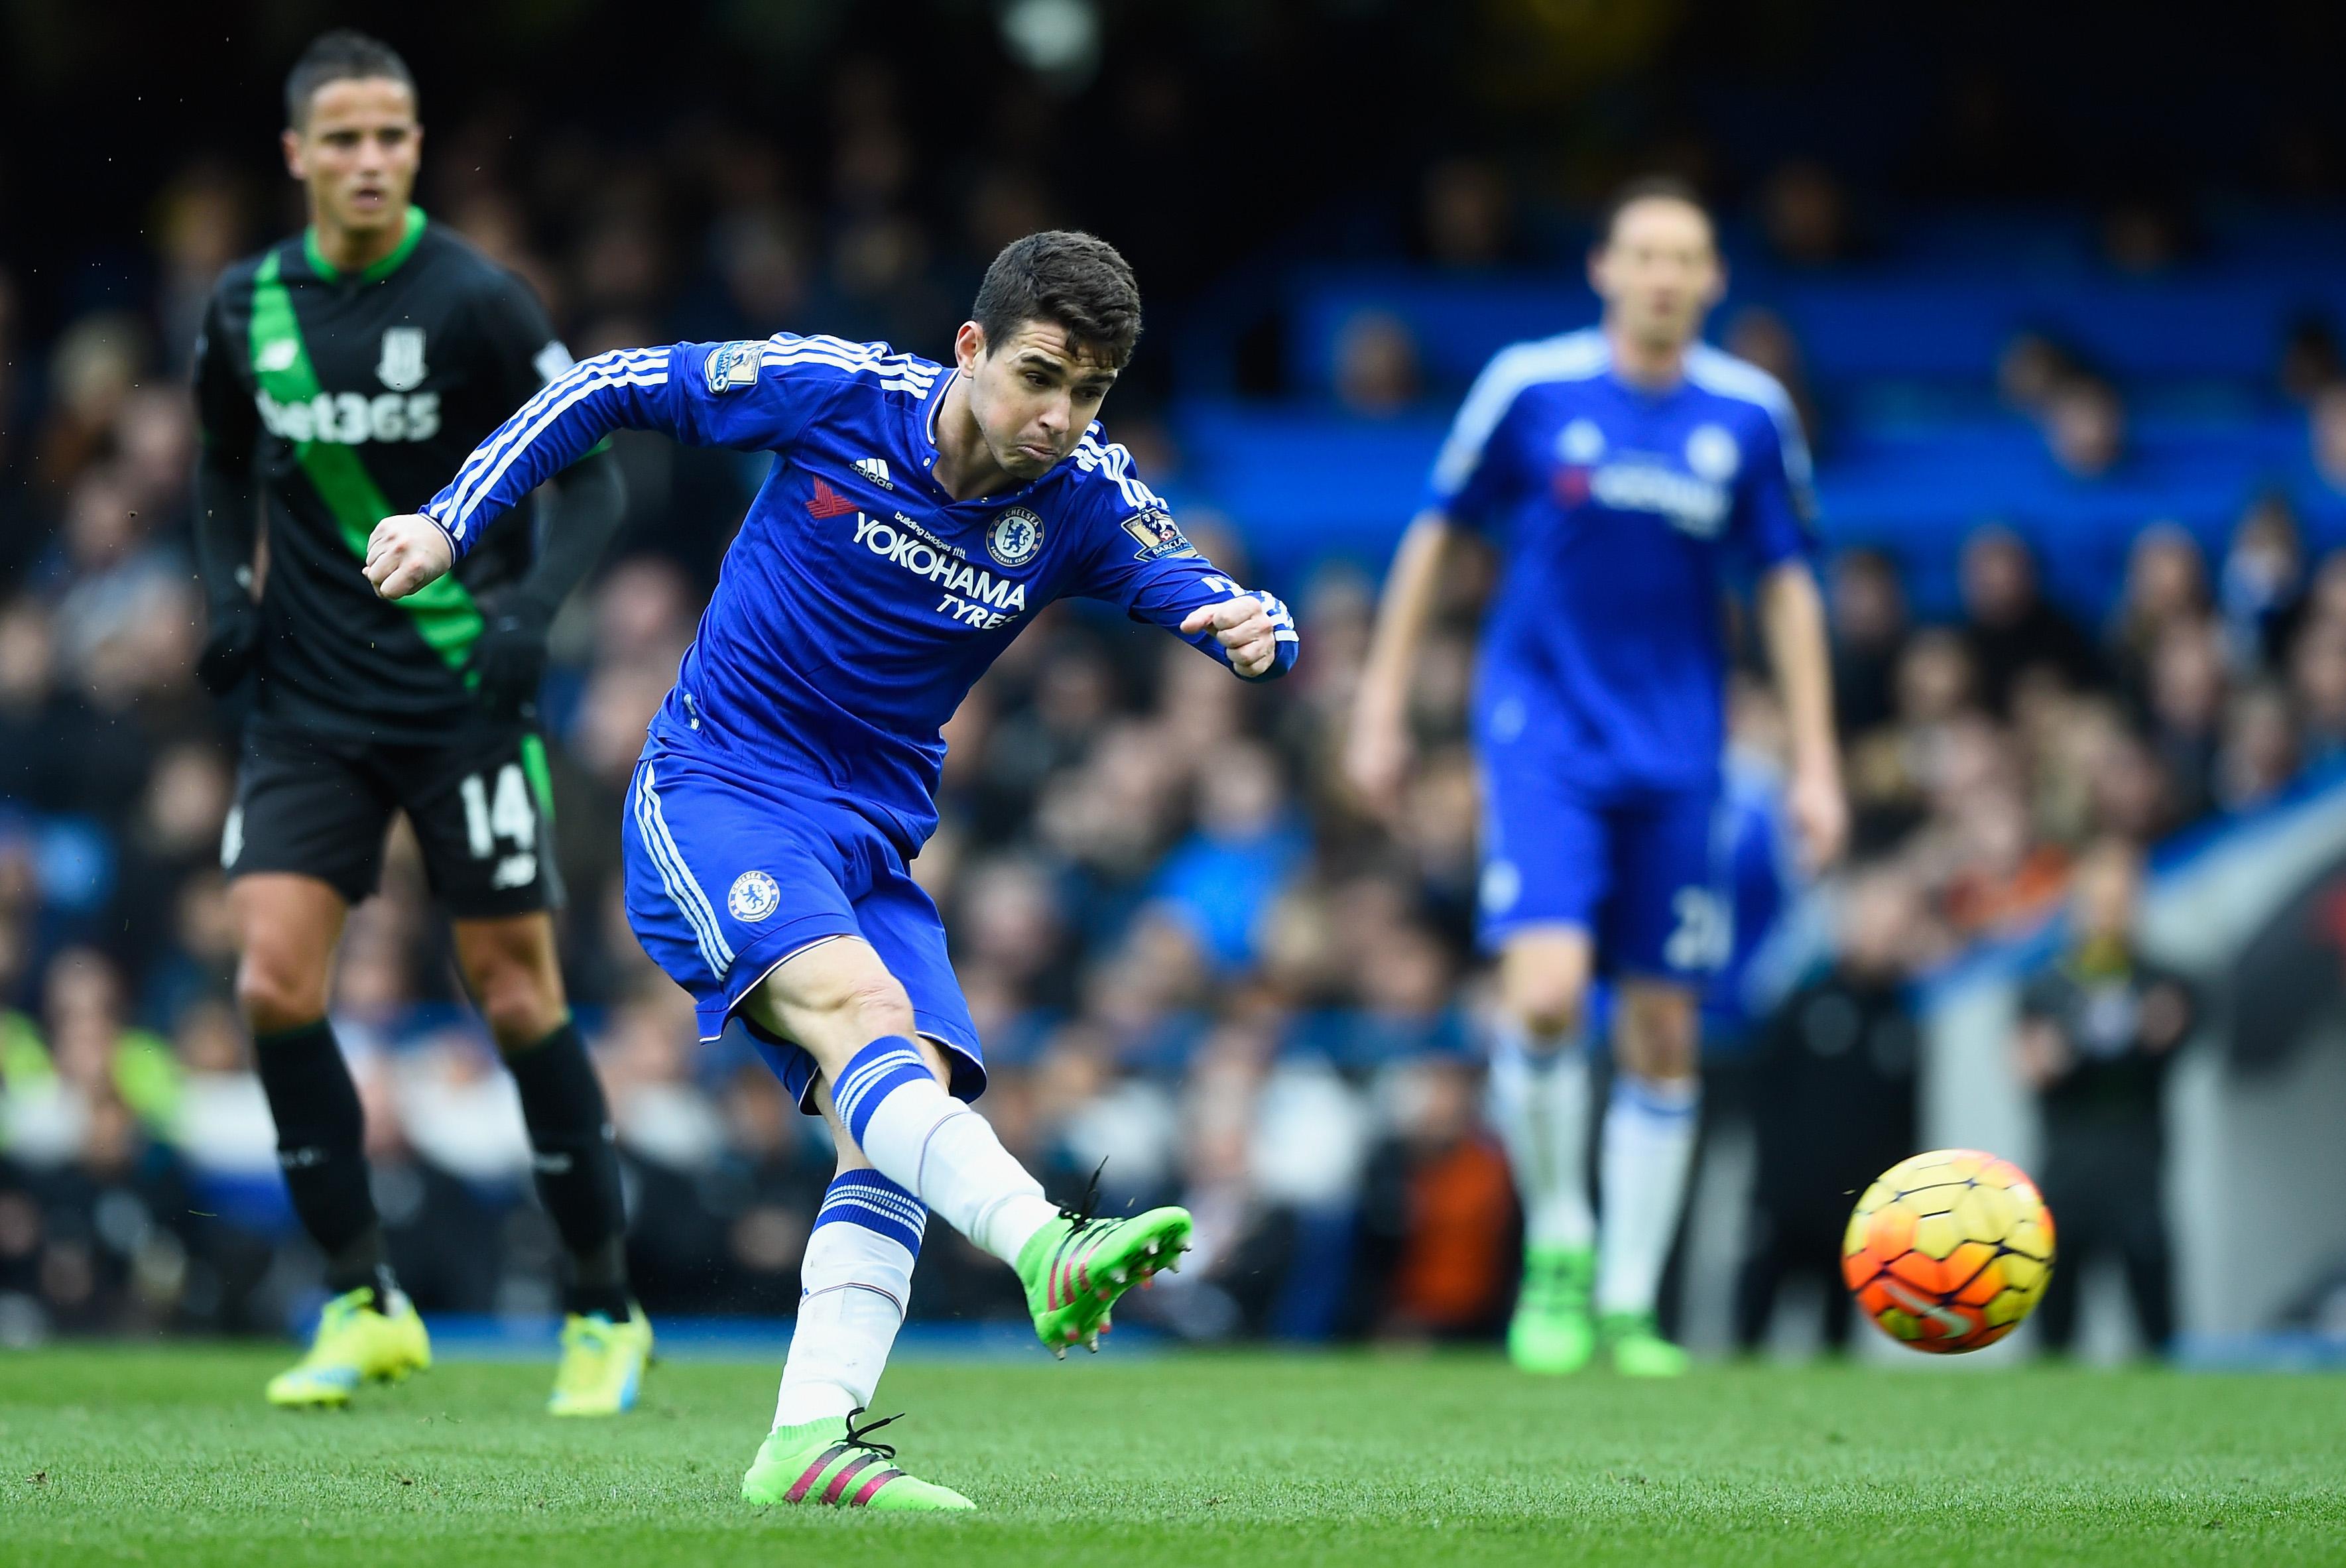 Chelsea FC player evaluations 2015/16: Oscar